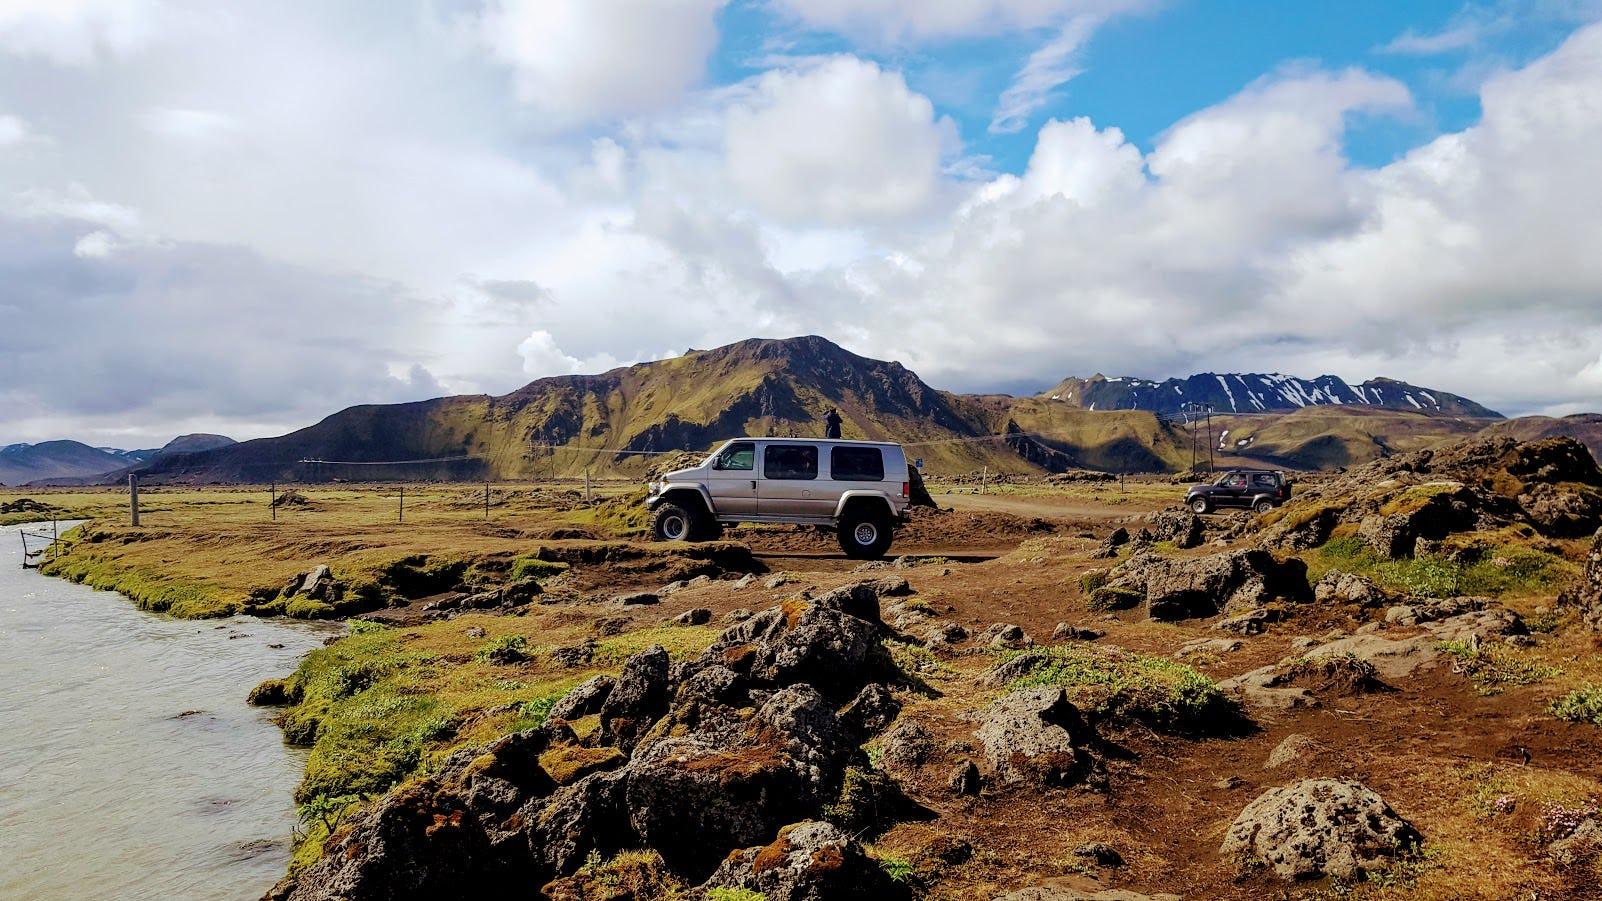 Tagestour nach Landmannalaugar | Super-Jeep Abenteuer